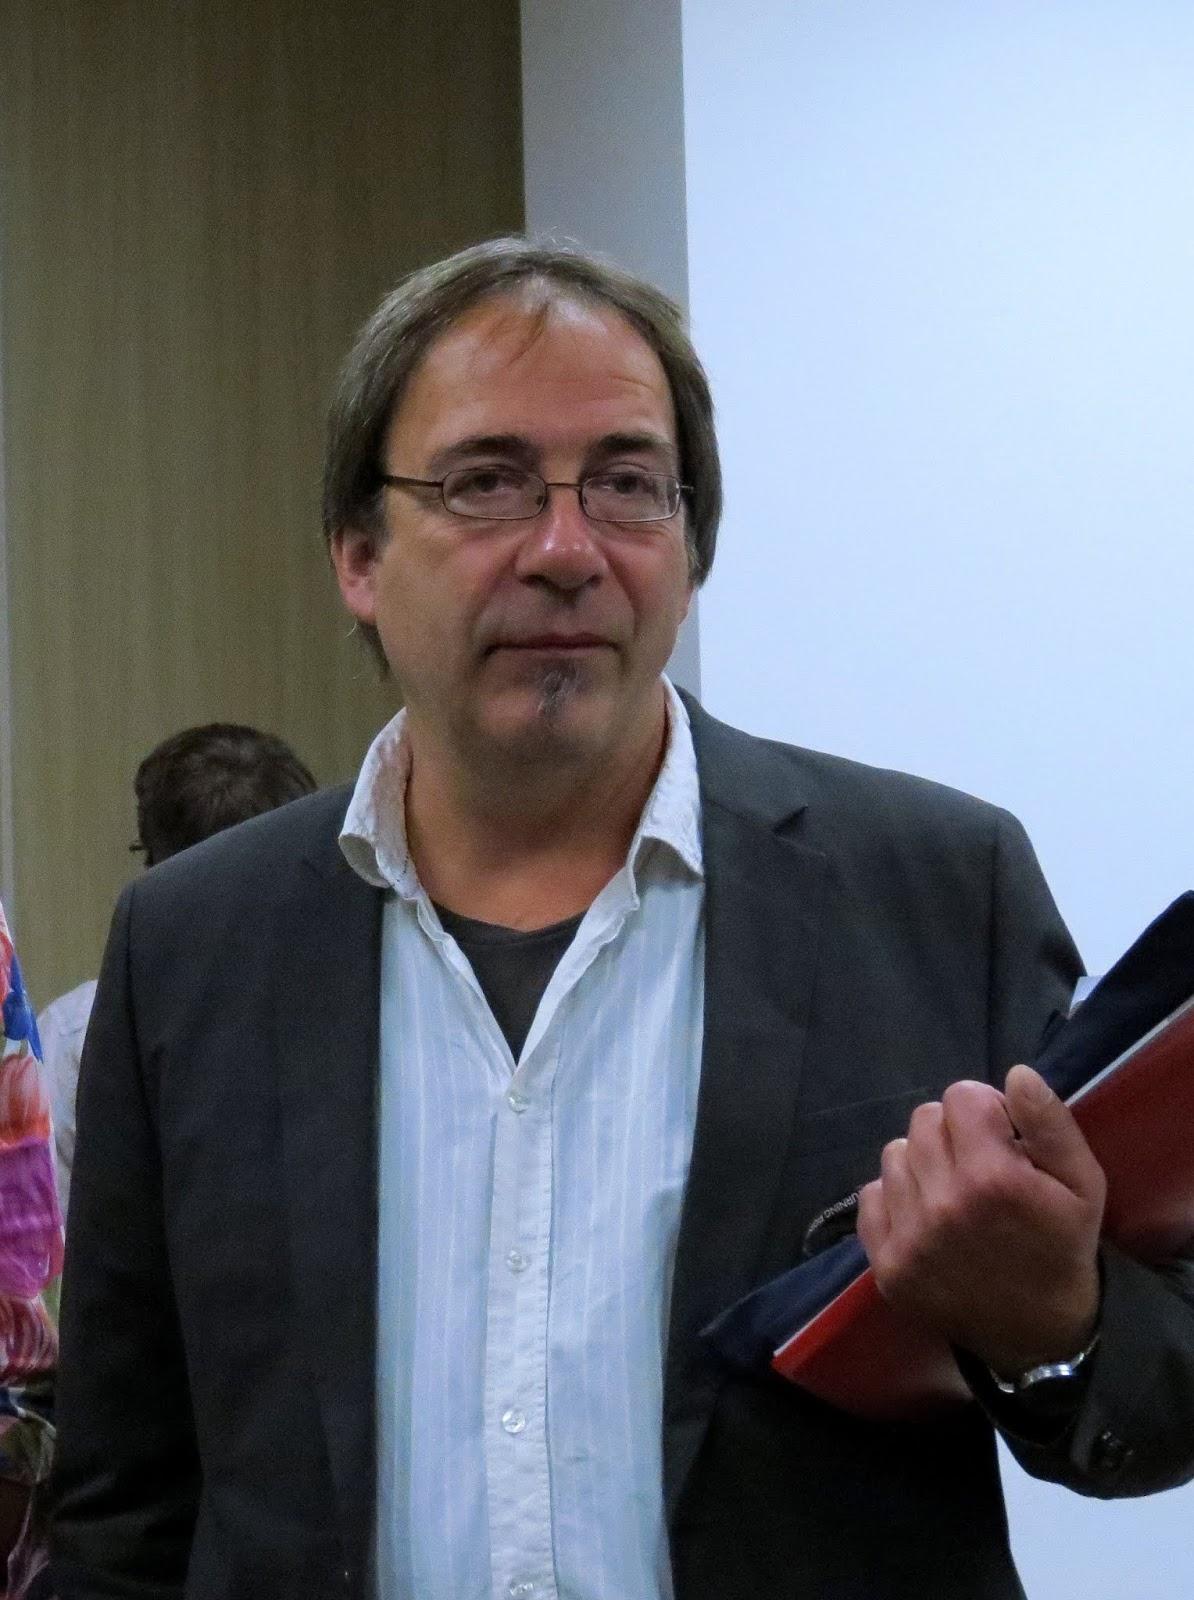 Martin Ernerth